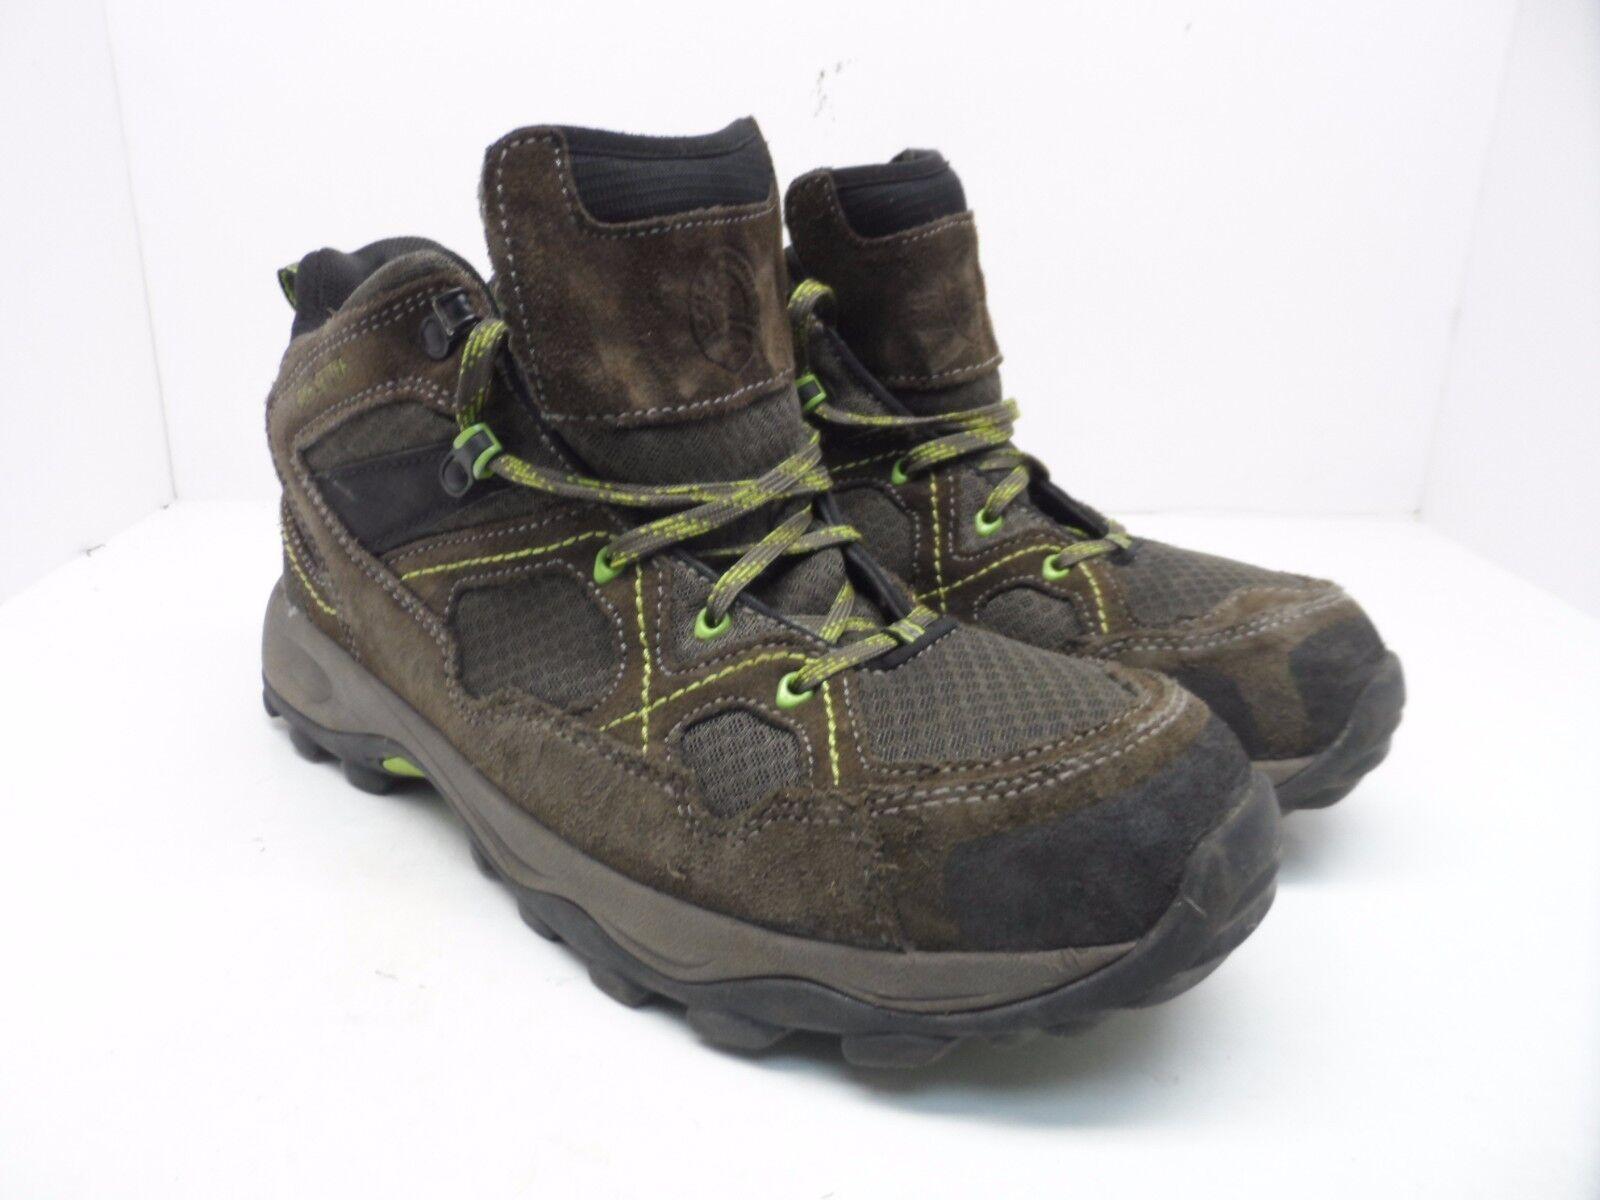 Irish Setter Work Men's Afton Hiker 83408 Steel Toe Work Boot Brown Size 11.5D